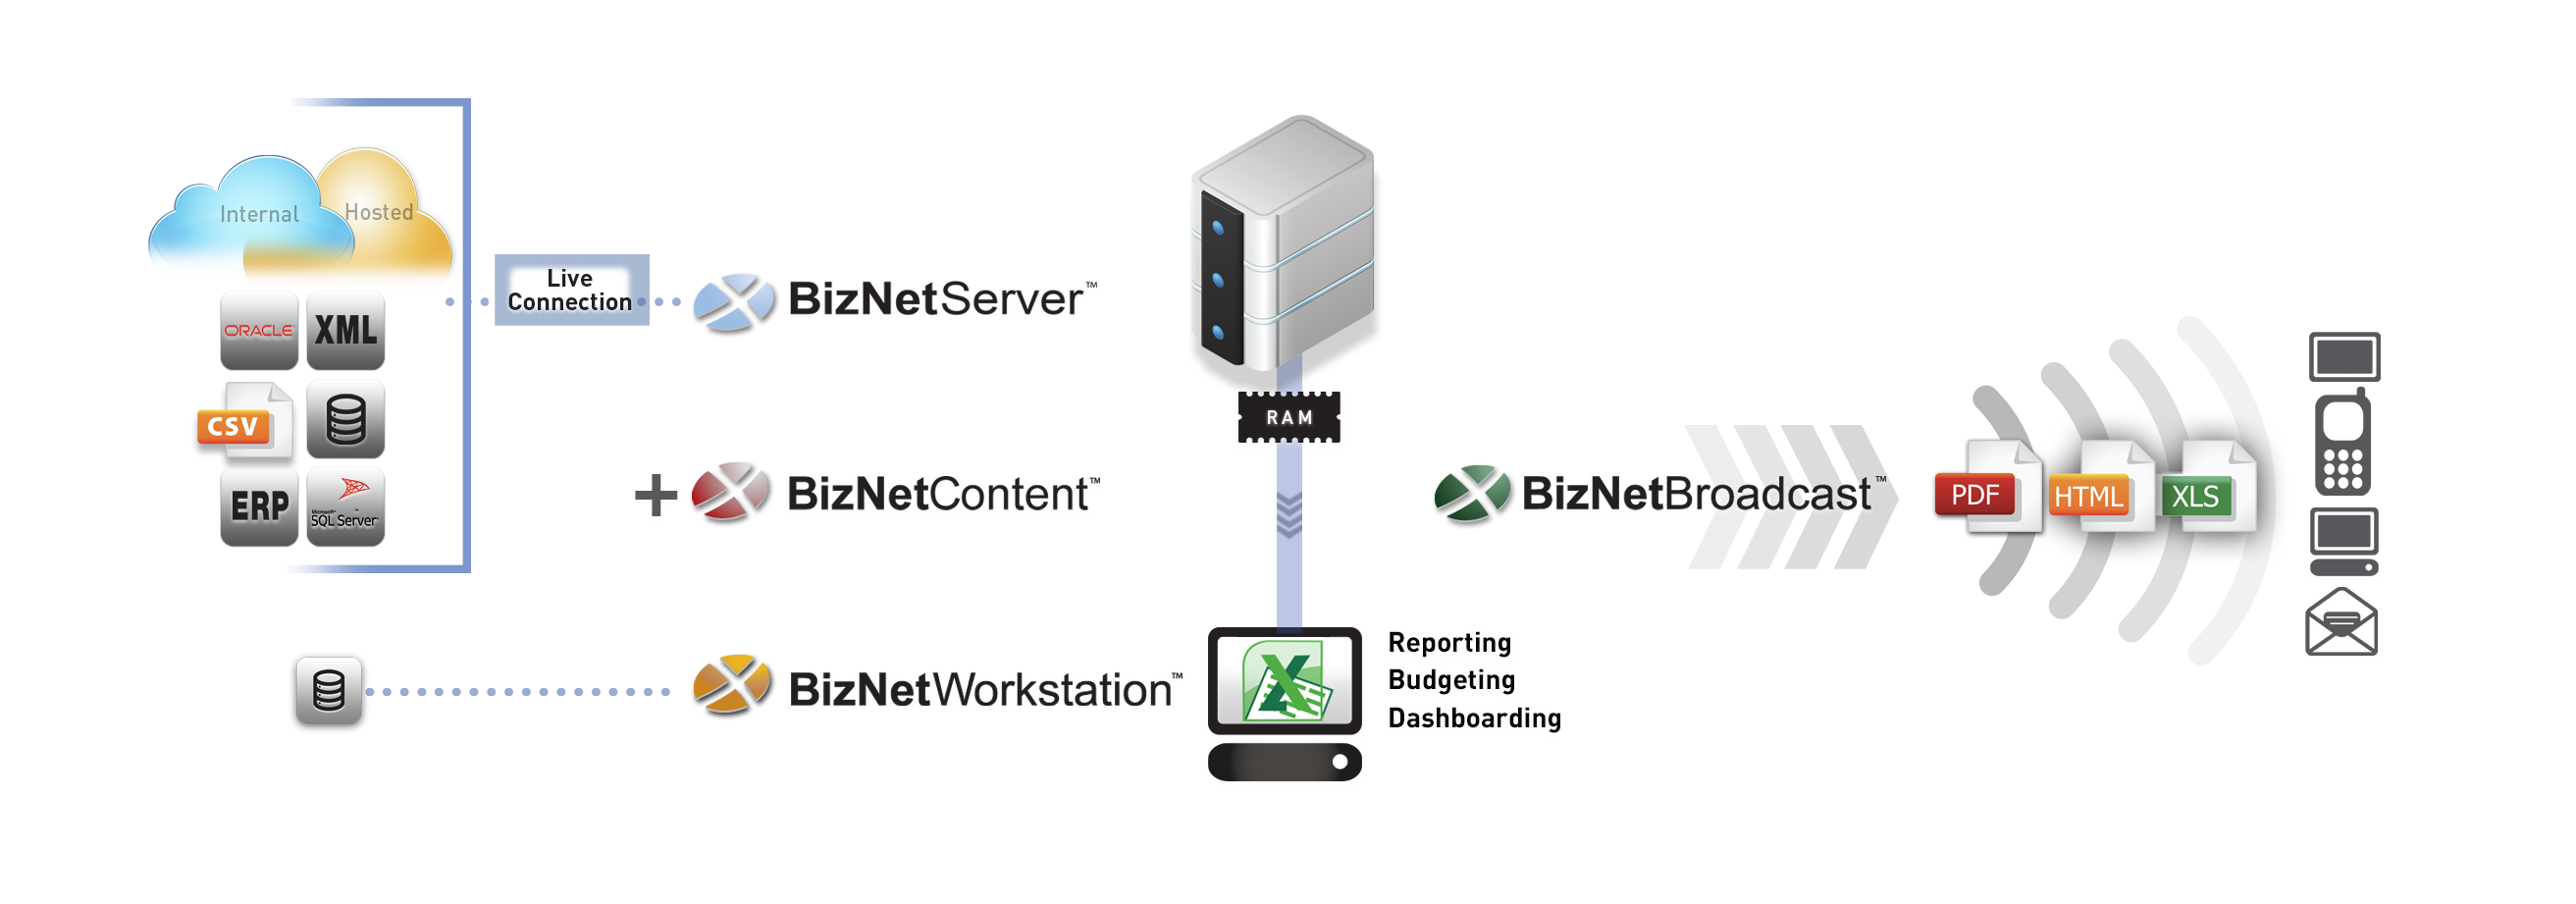 http://www.qad.com/Public/Collateral/biznet-framework.png